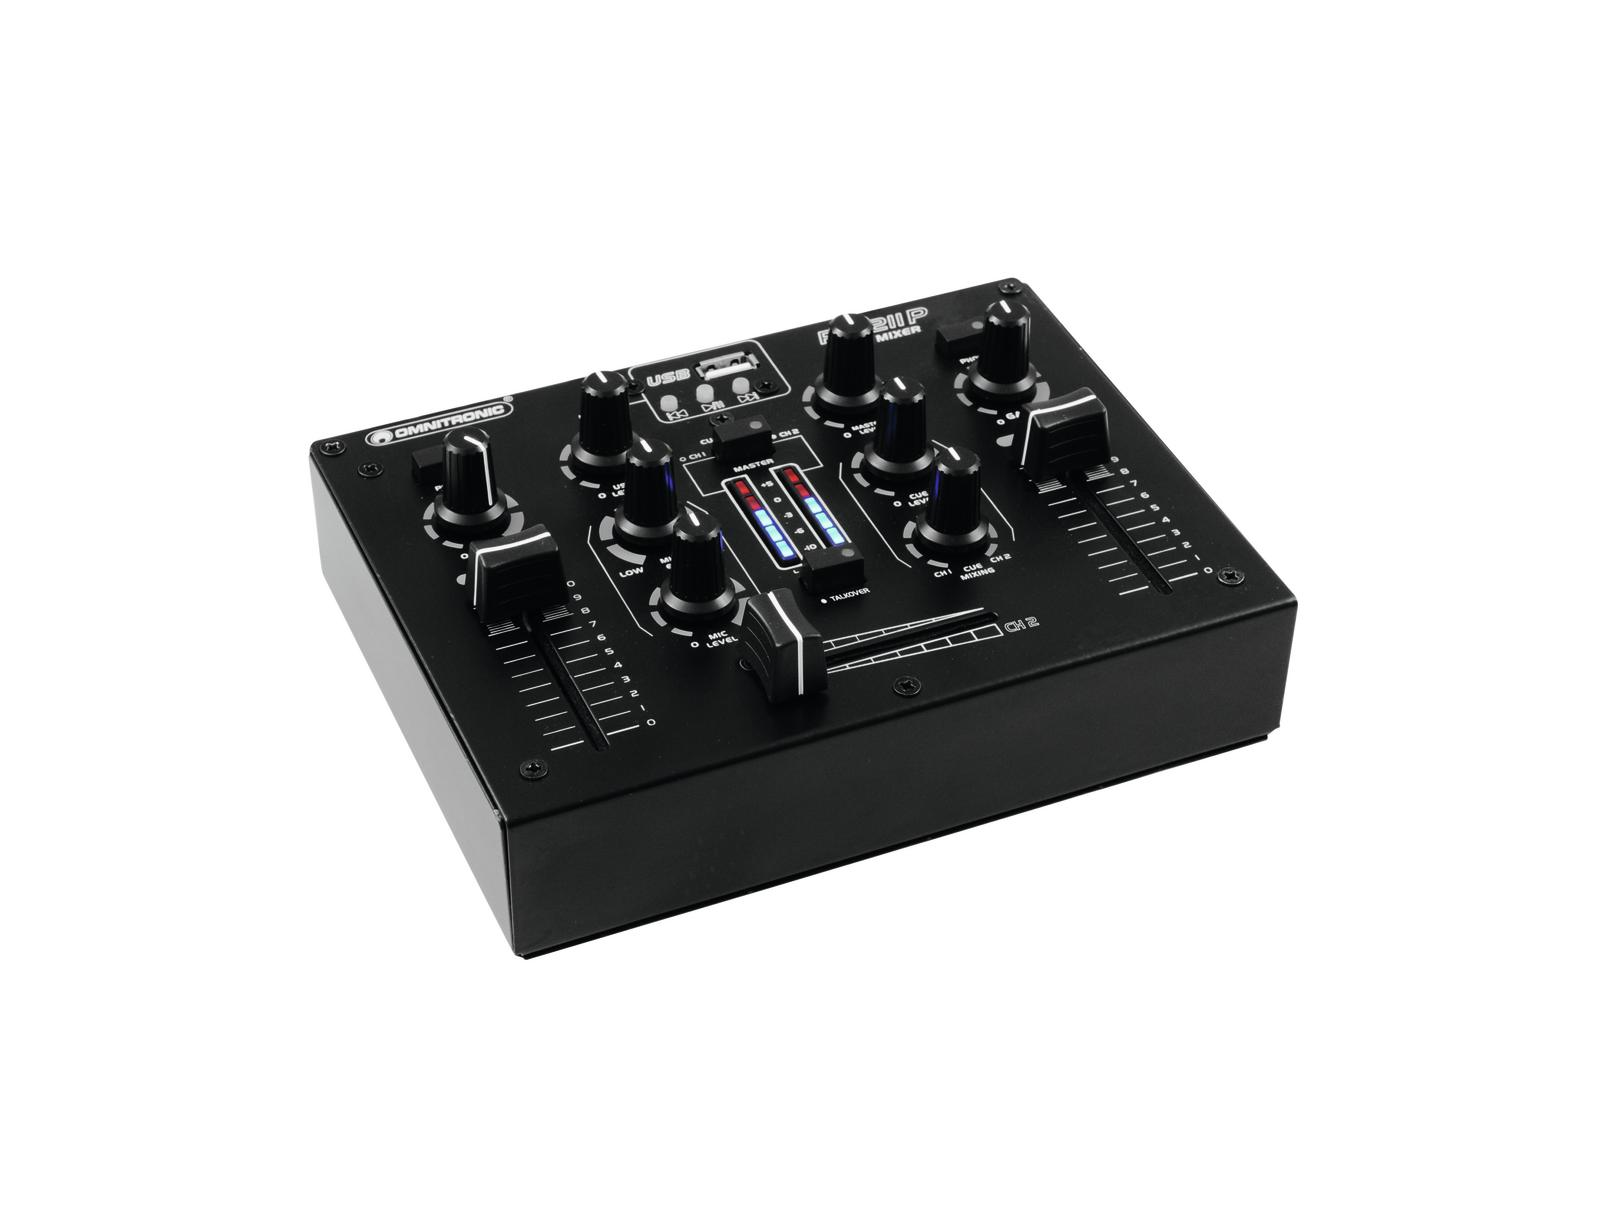 omnitronic-pm-211p-dj-mixer-mit-player